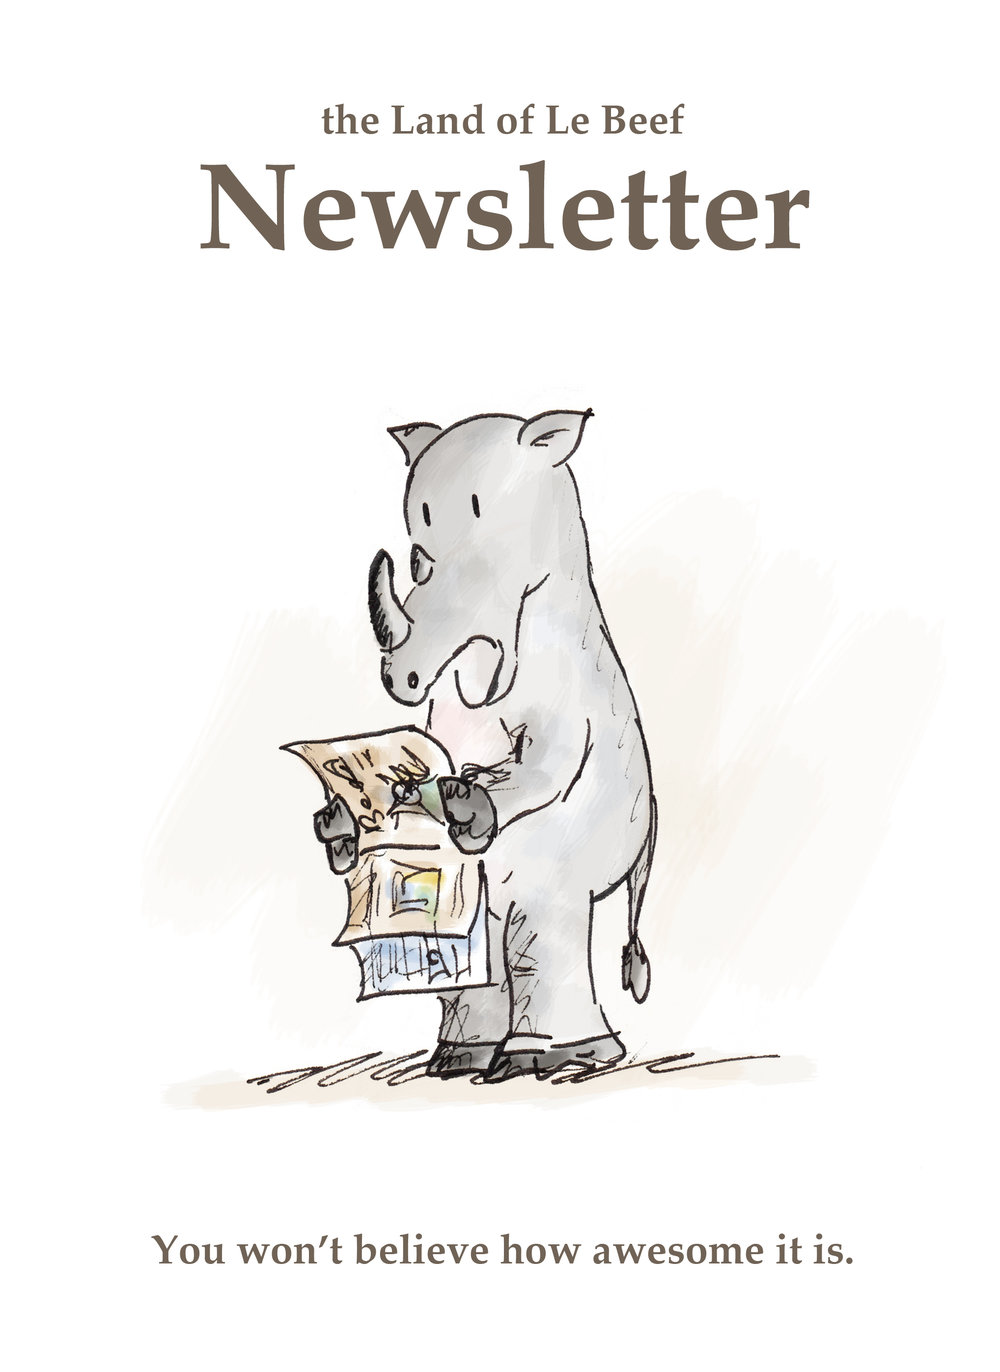 Beef_Newsletter_03.jpg